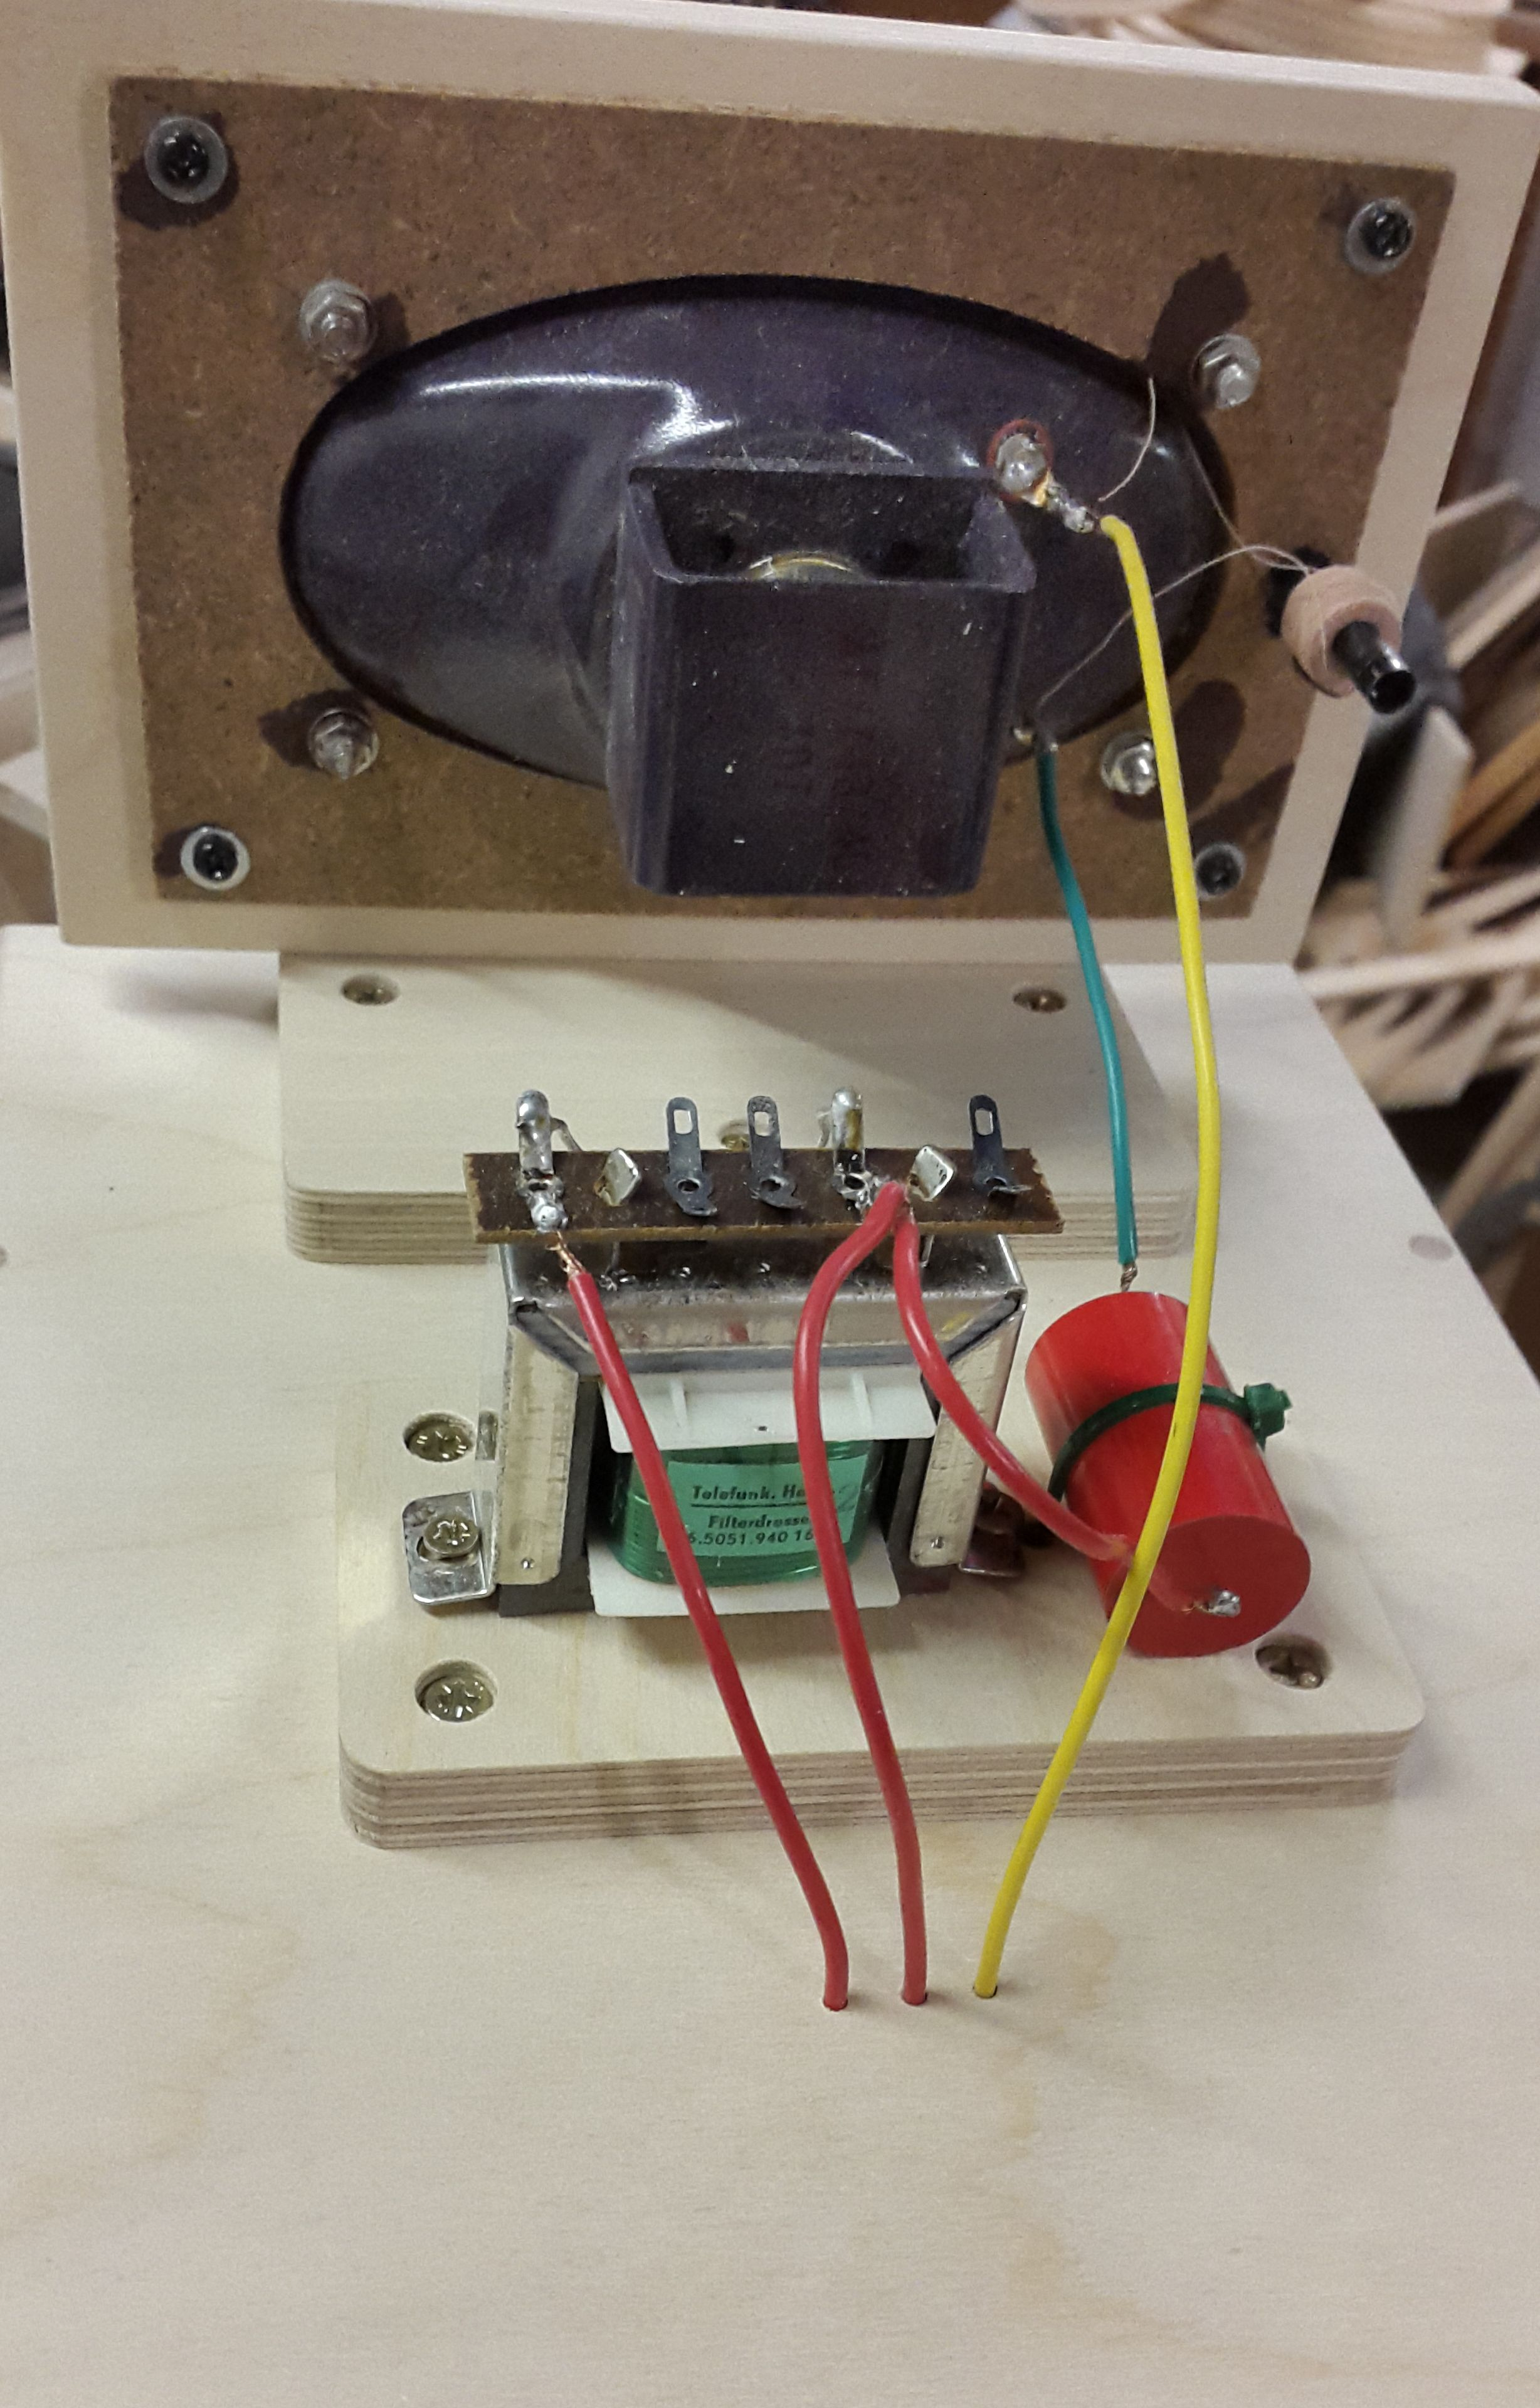 telefunky telefunken inductor metalised polypropylene film capacitor wire wound resistor [ 2456 x 3840 Pixel ]